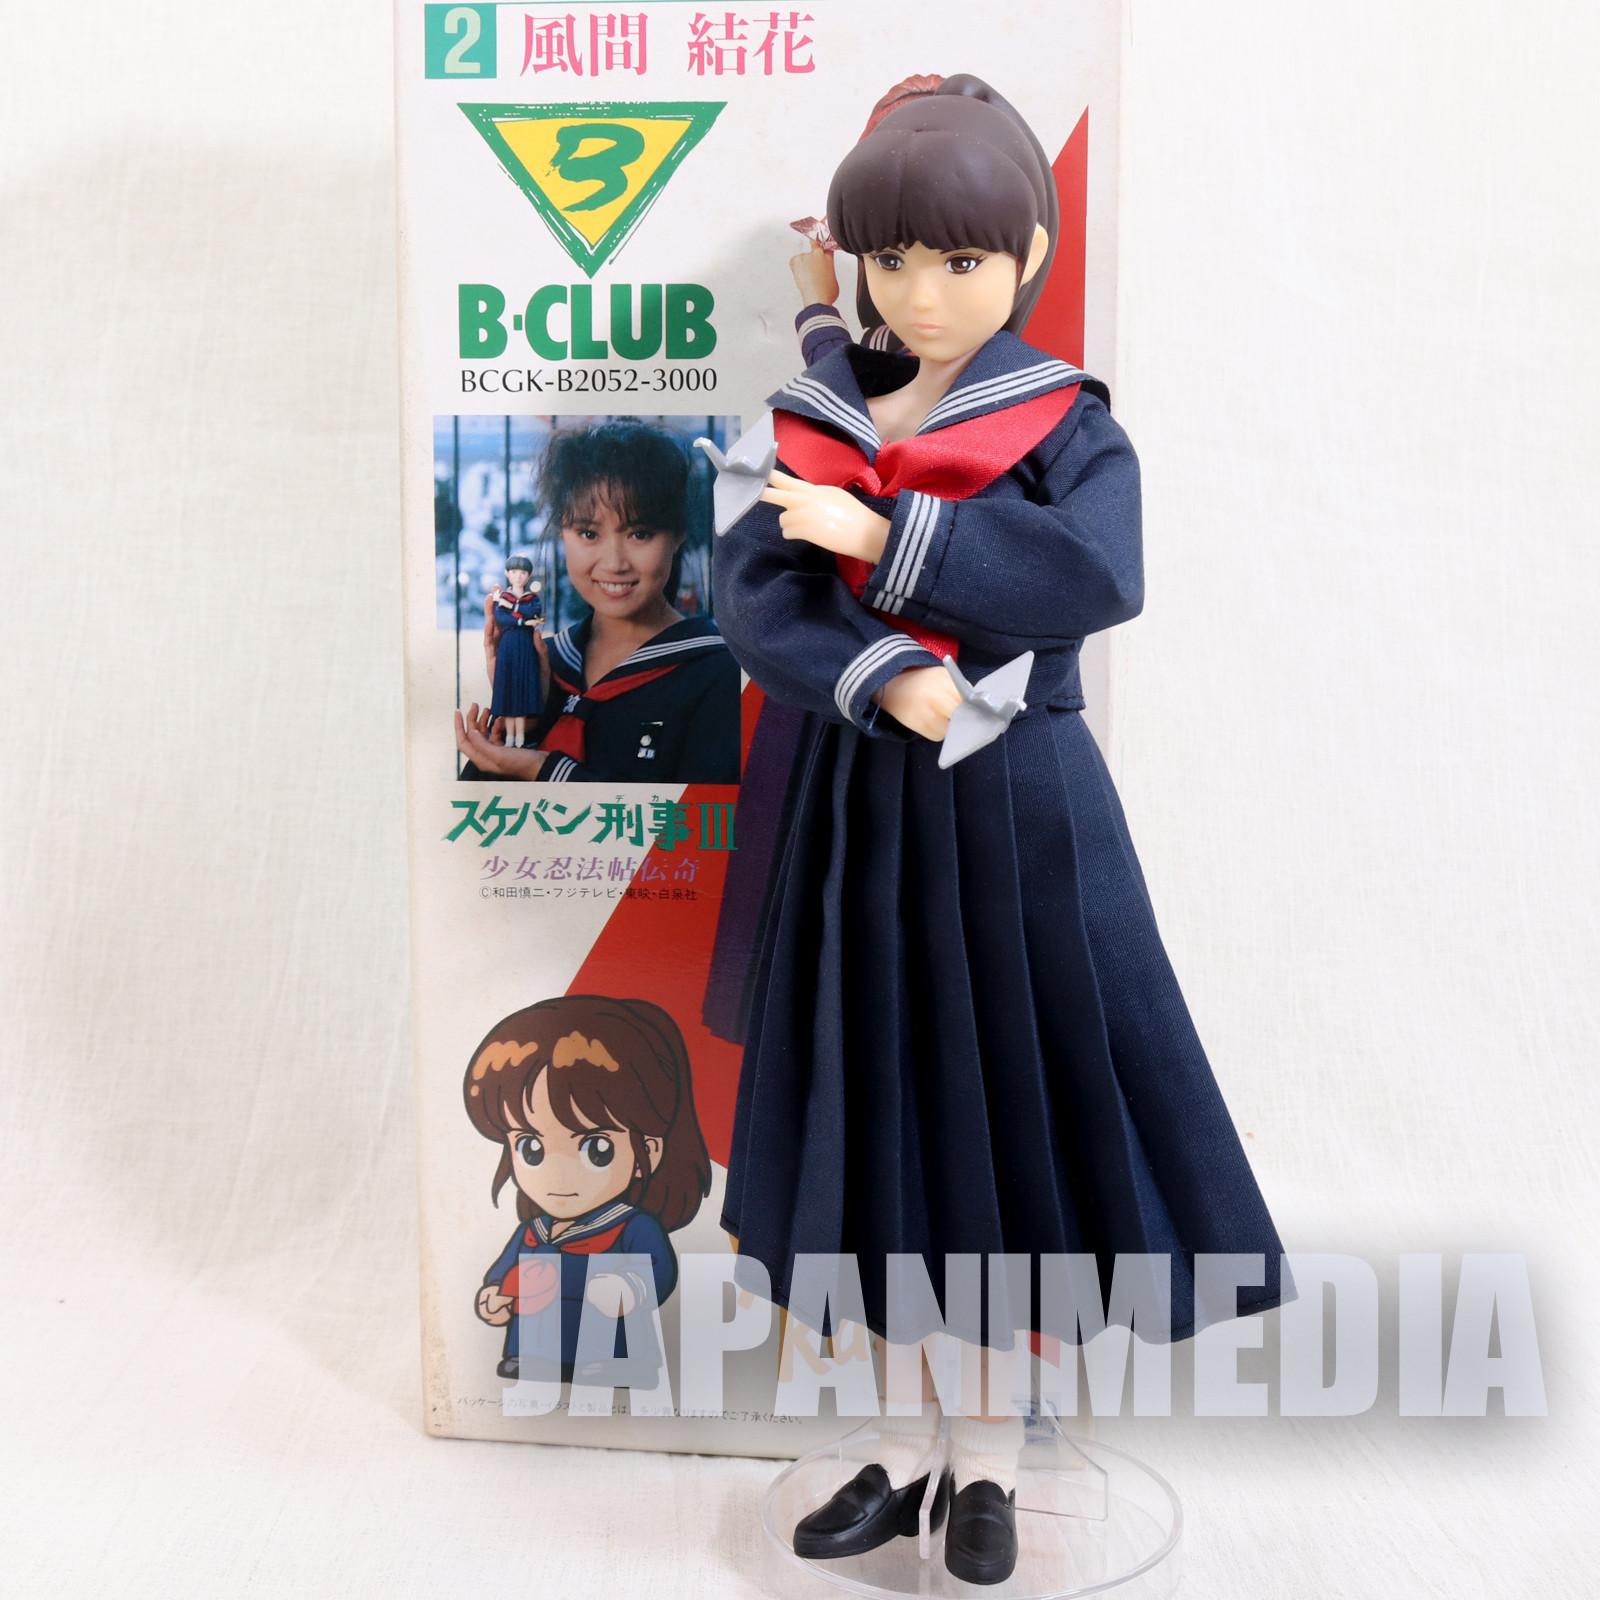 RARE! Sukeban Deka Yuka Kazama Live-action ver. 1/6 Scale Figure Yuka Oonishi